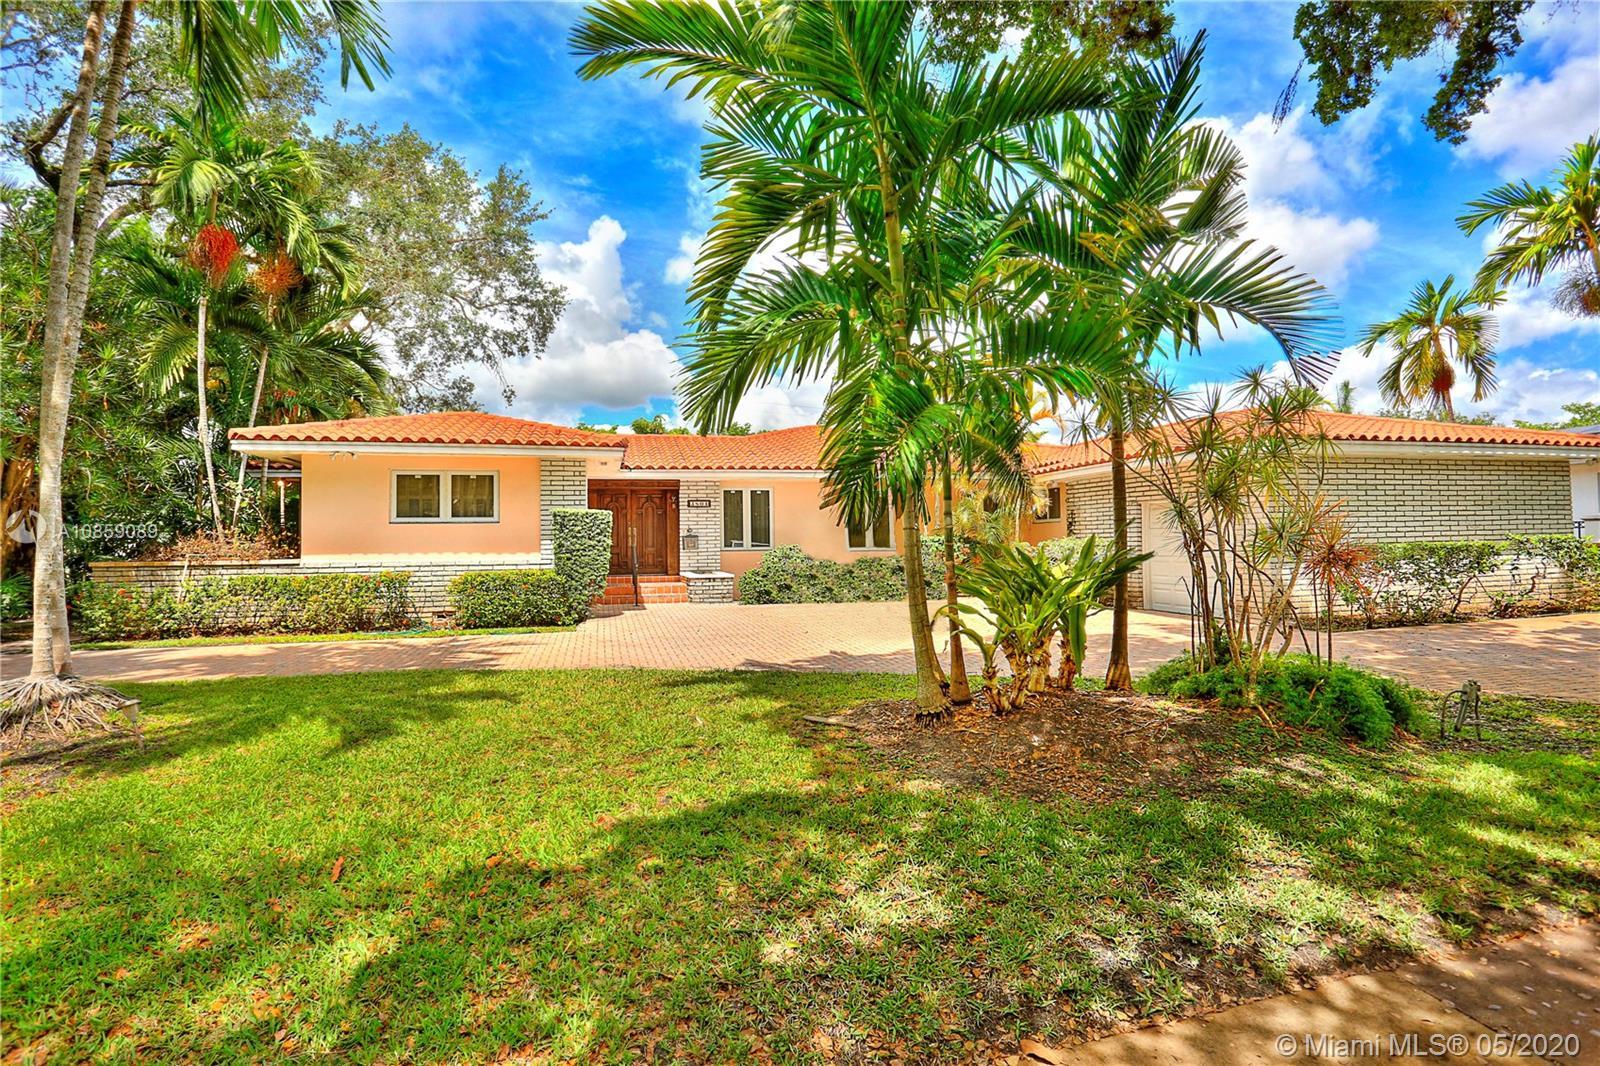 3804  Monserrate St  For Sale A10859089, FL